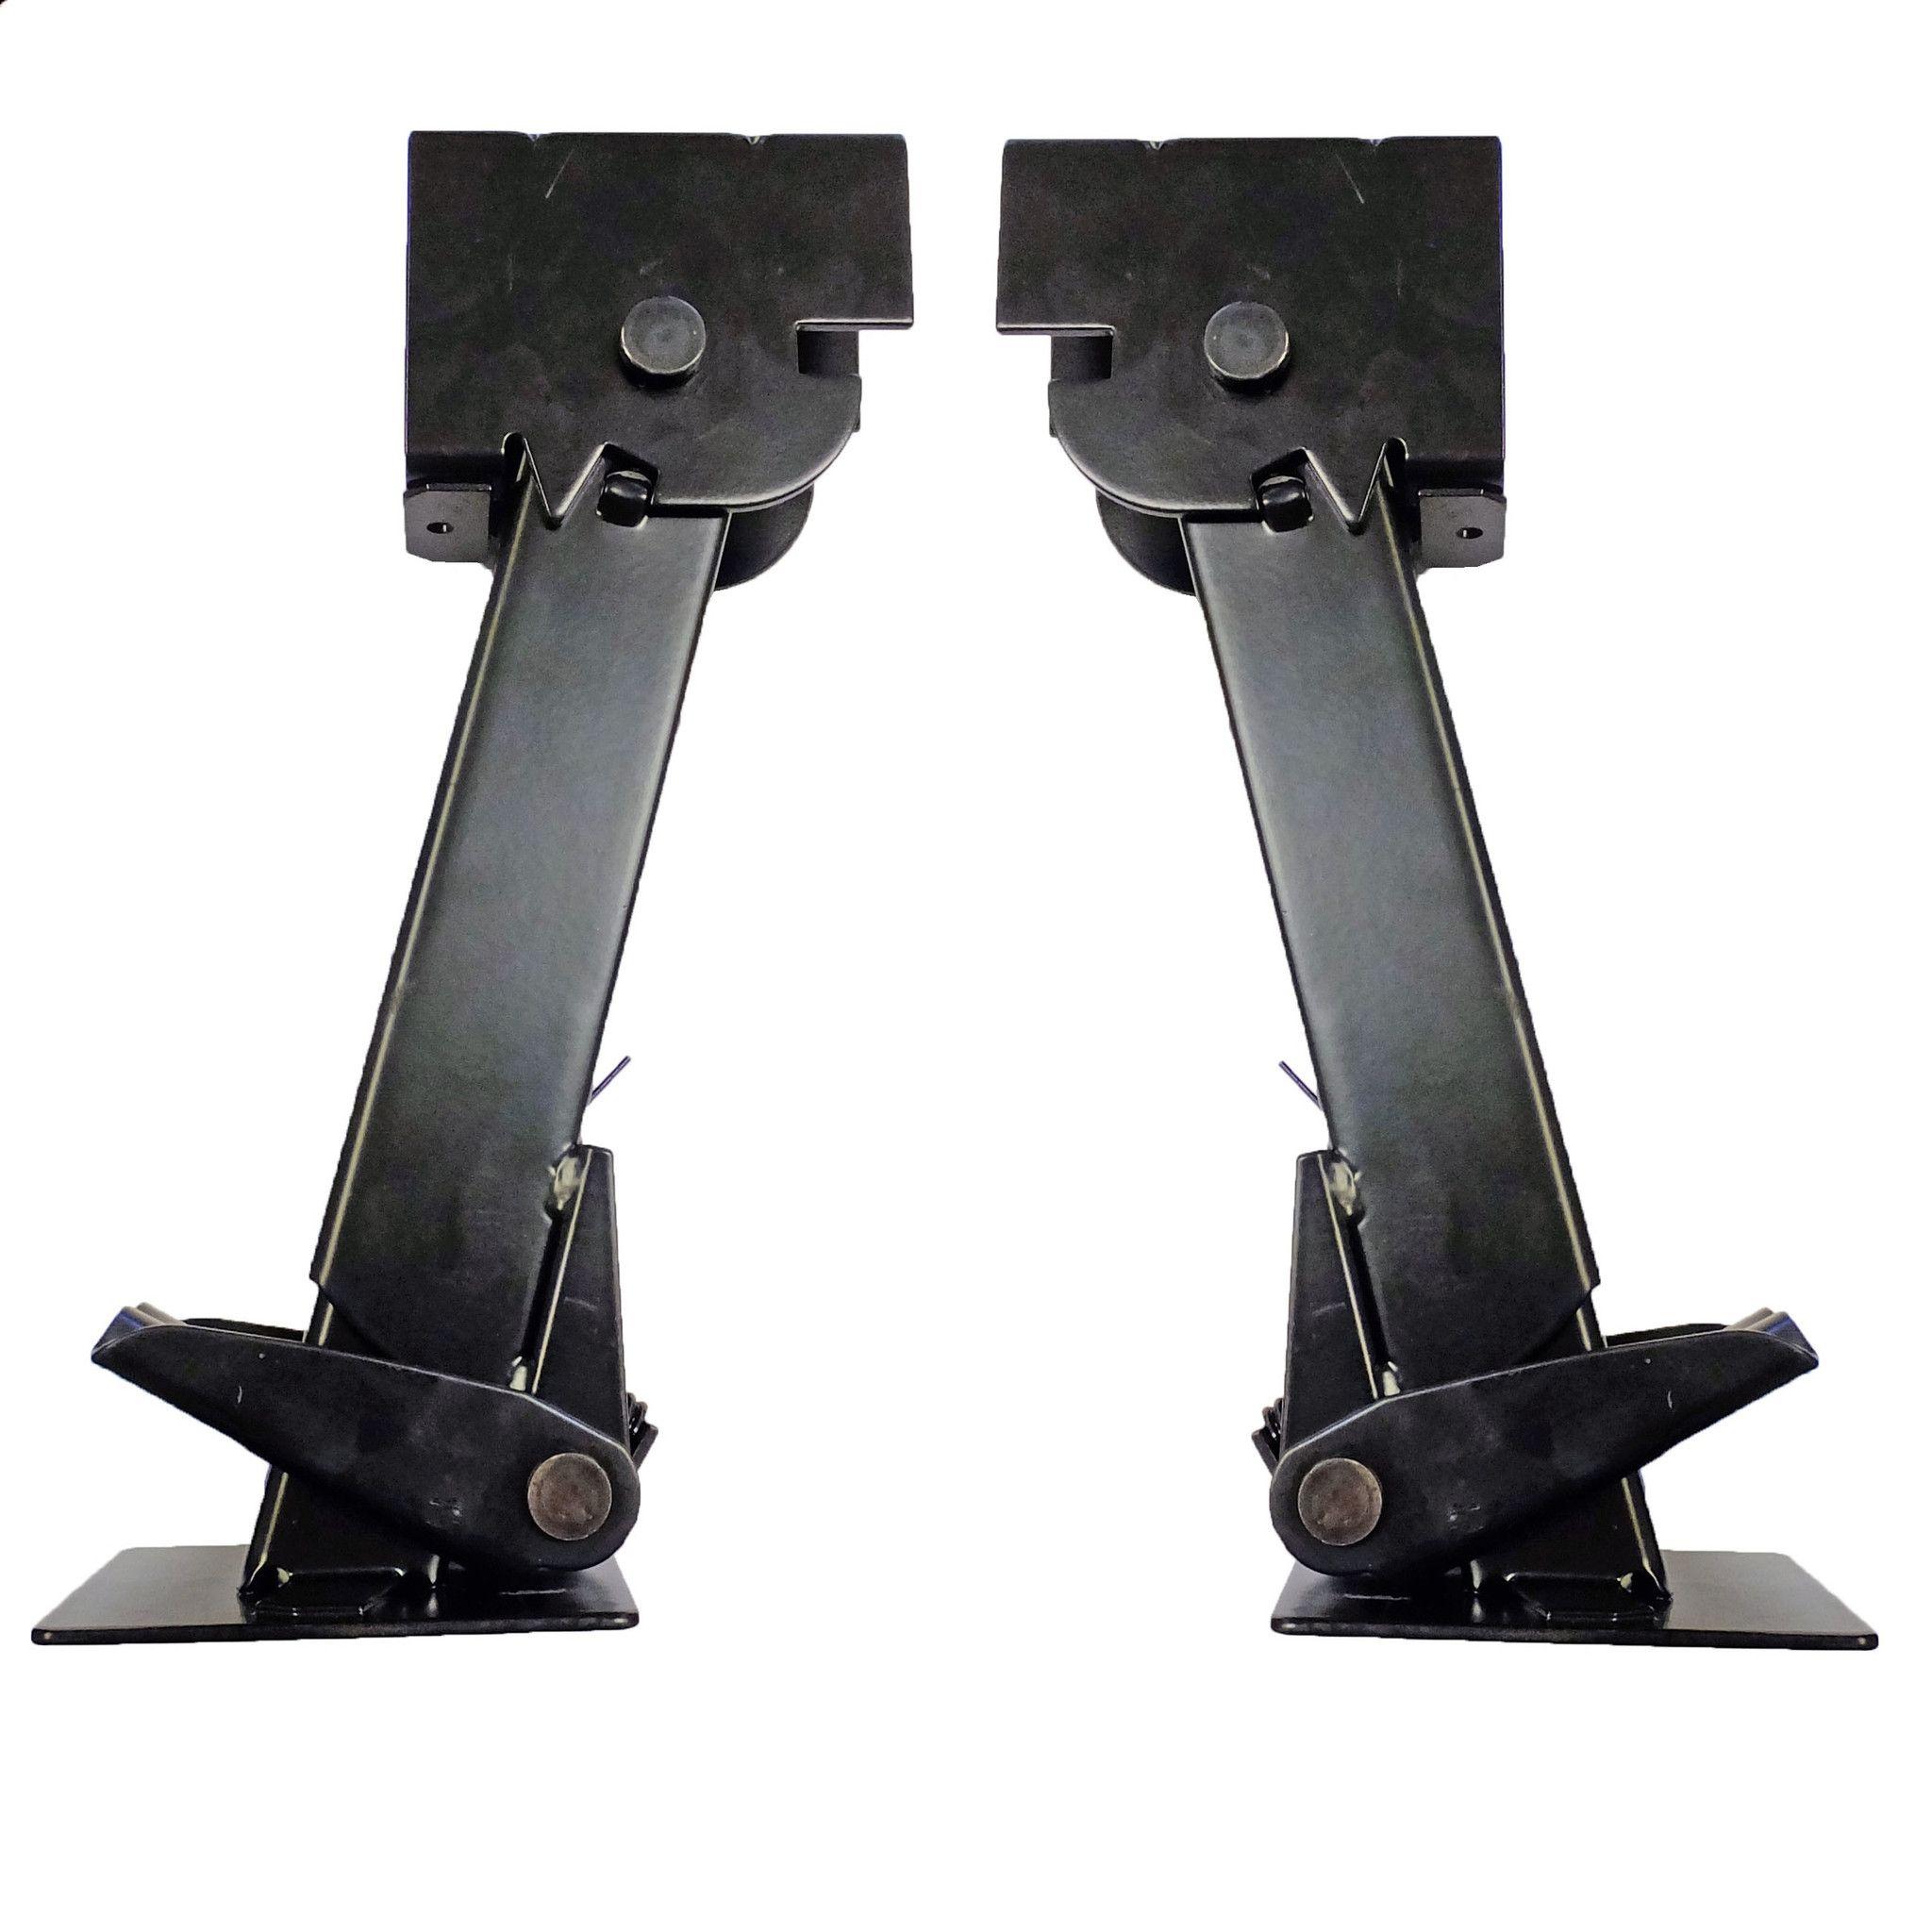 Trailer Stabilizer Jack Set Trailer stabilizer jacks